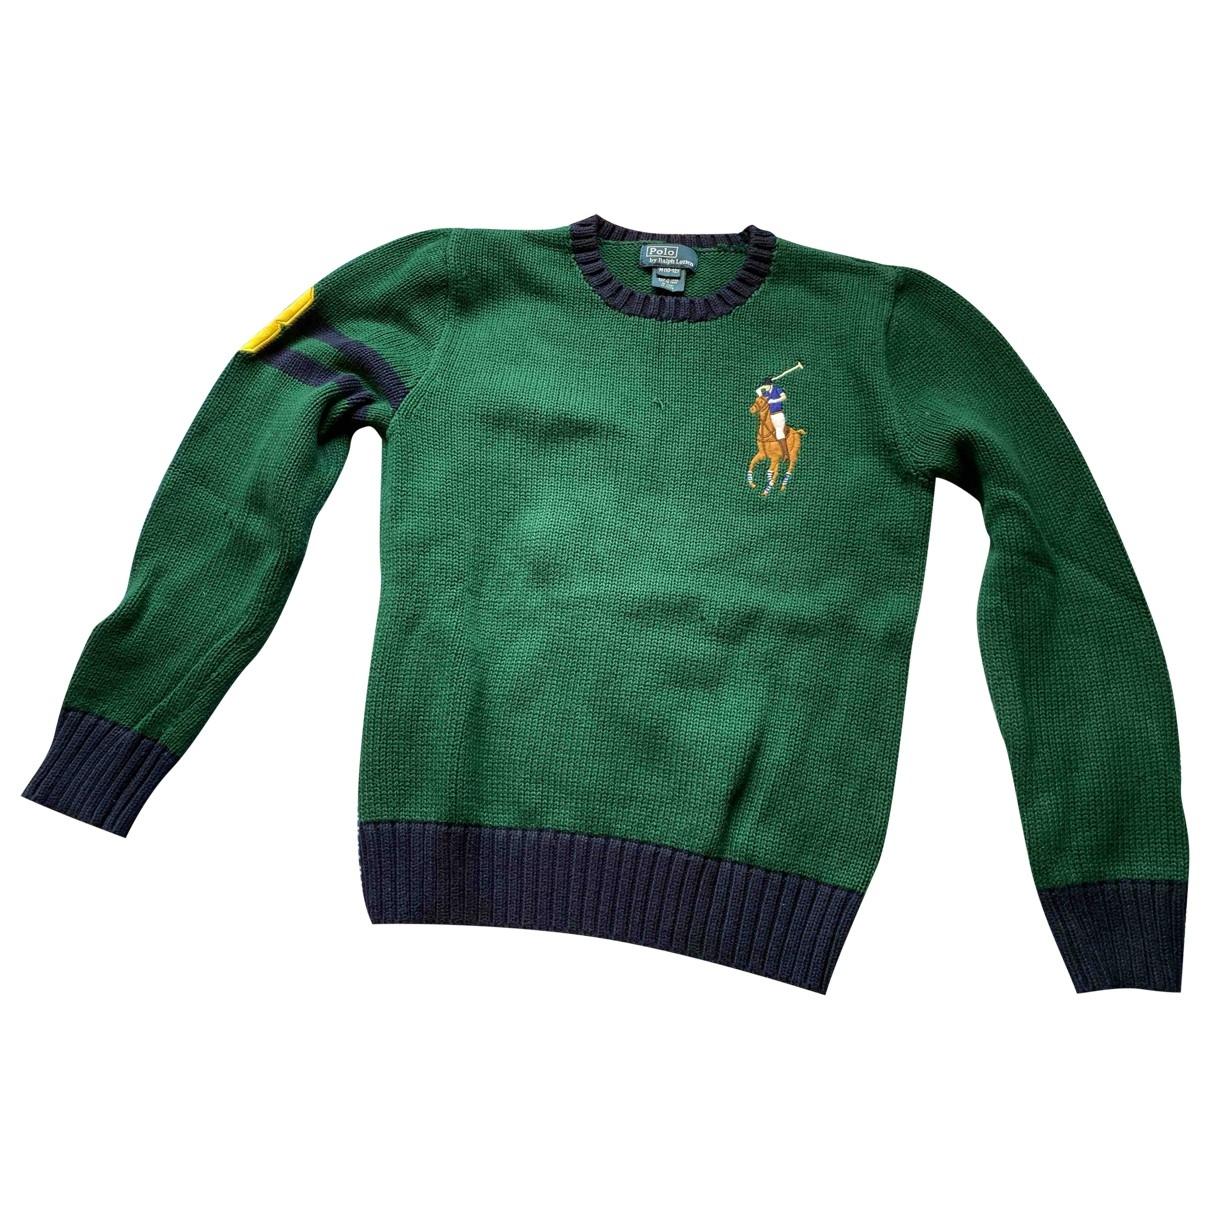 Polo Ralph Lauren \N Green Cotton Knitwear for Kids 12 years - XS FR